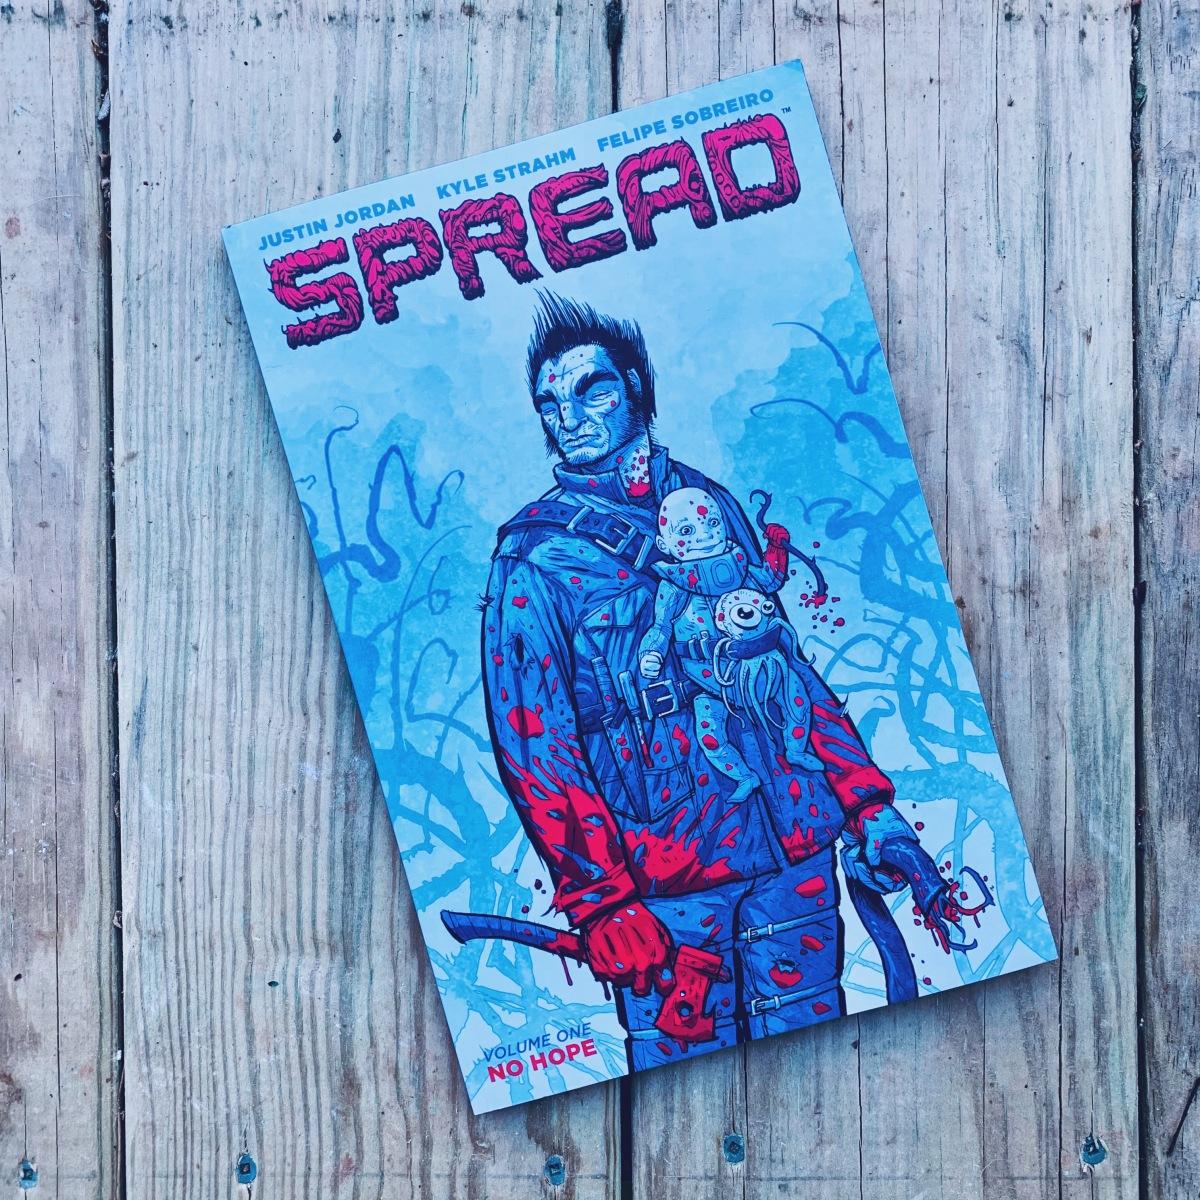 Spread Volume 1